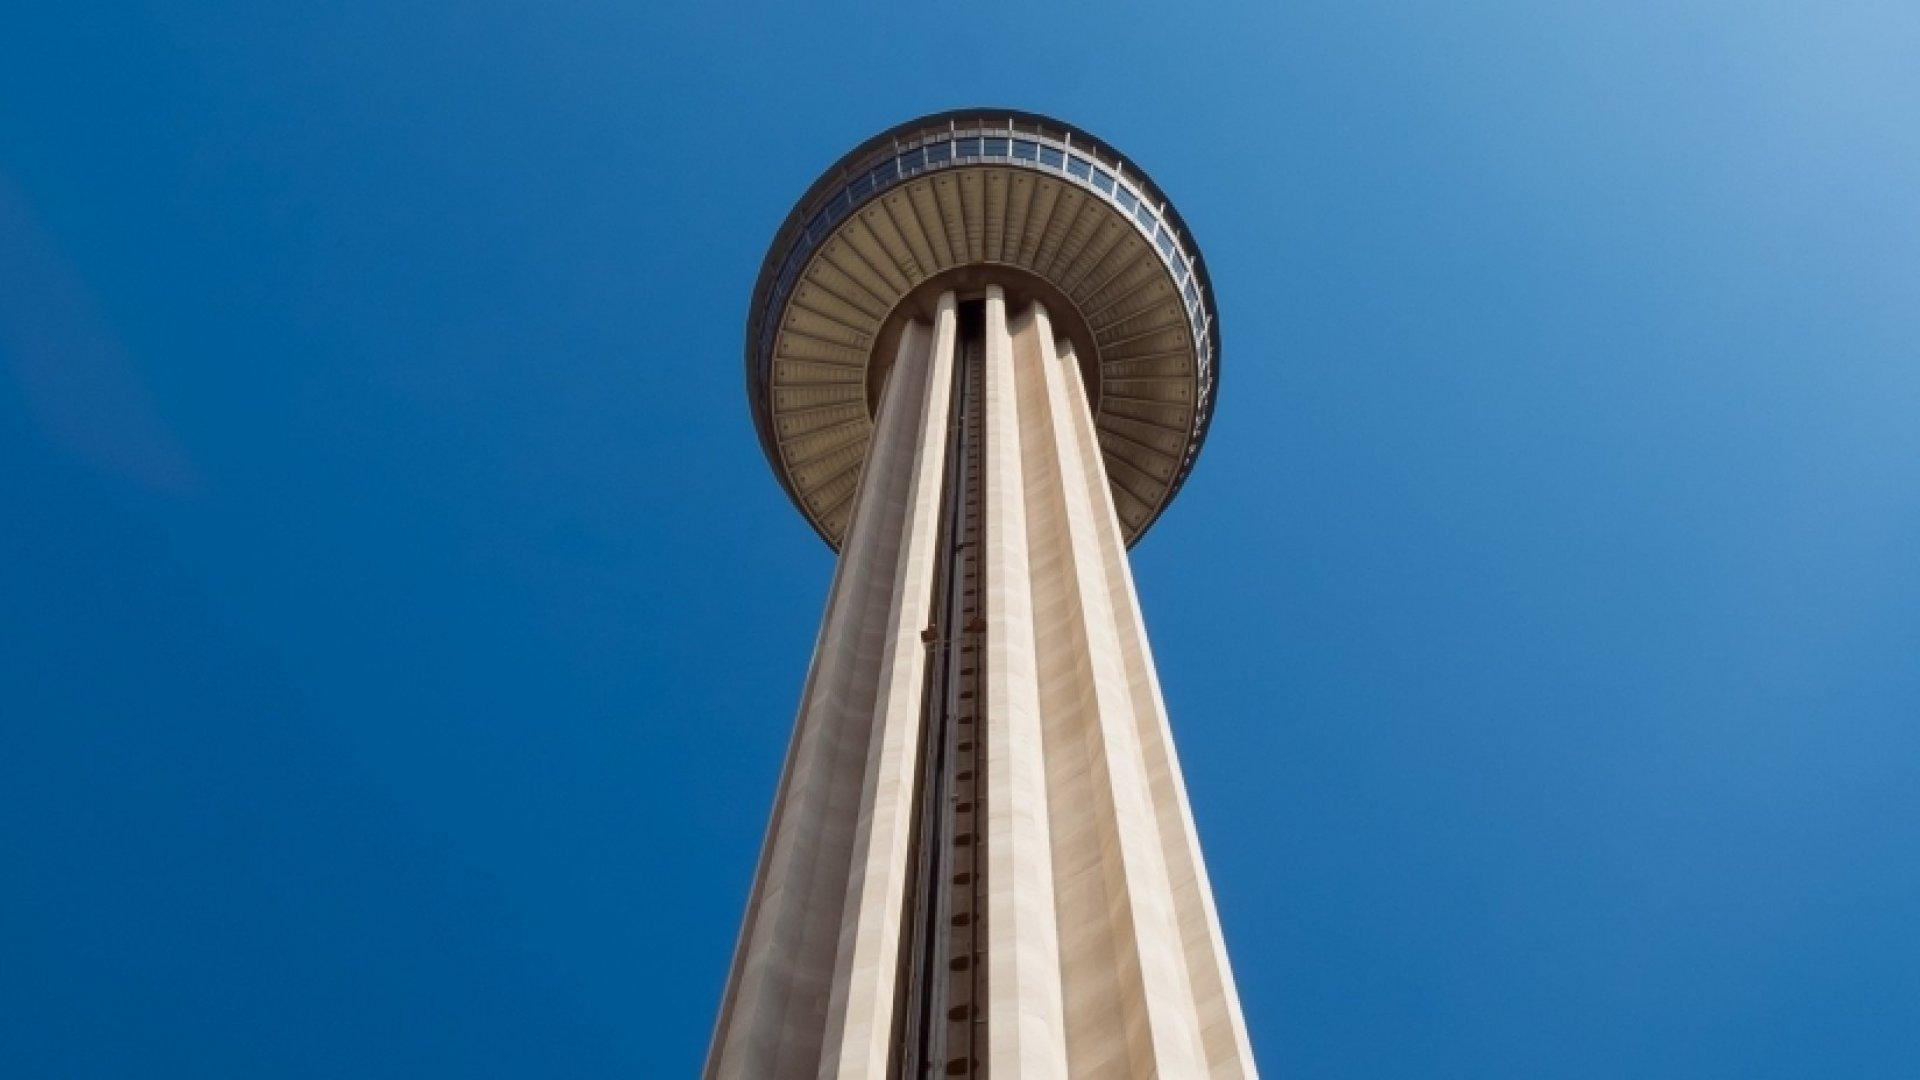 Tower of Americas in San Antonio, Texas.